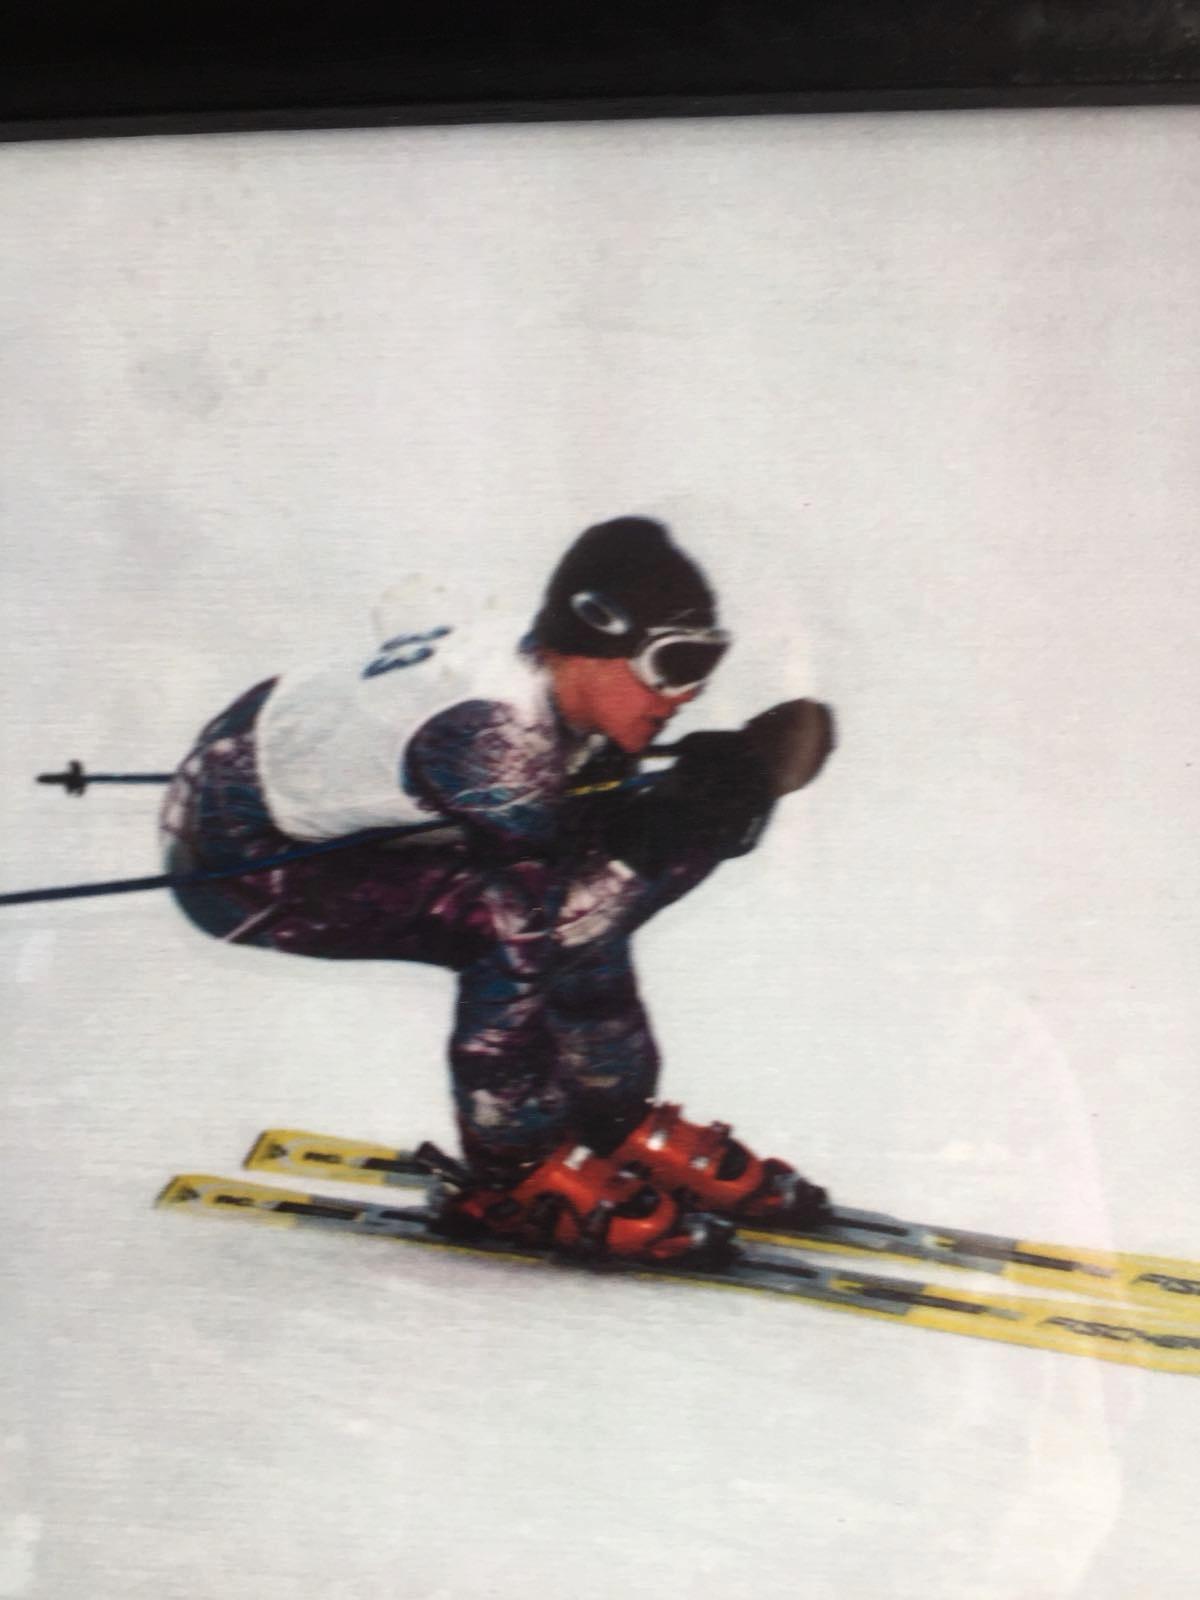 Brent-skiing-2.jpeg